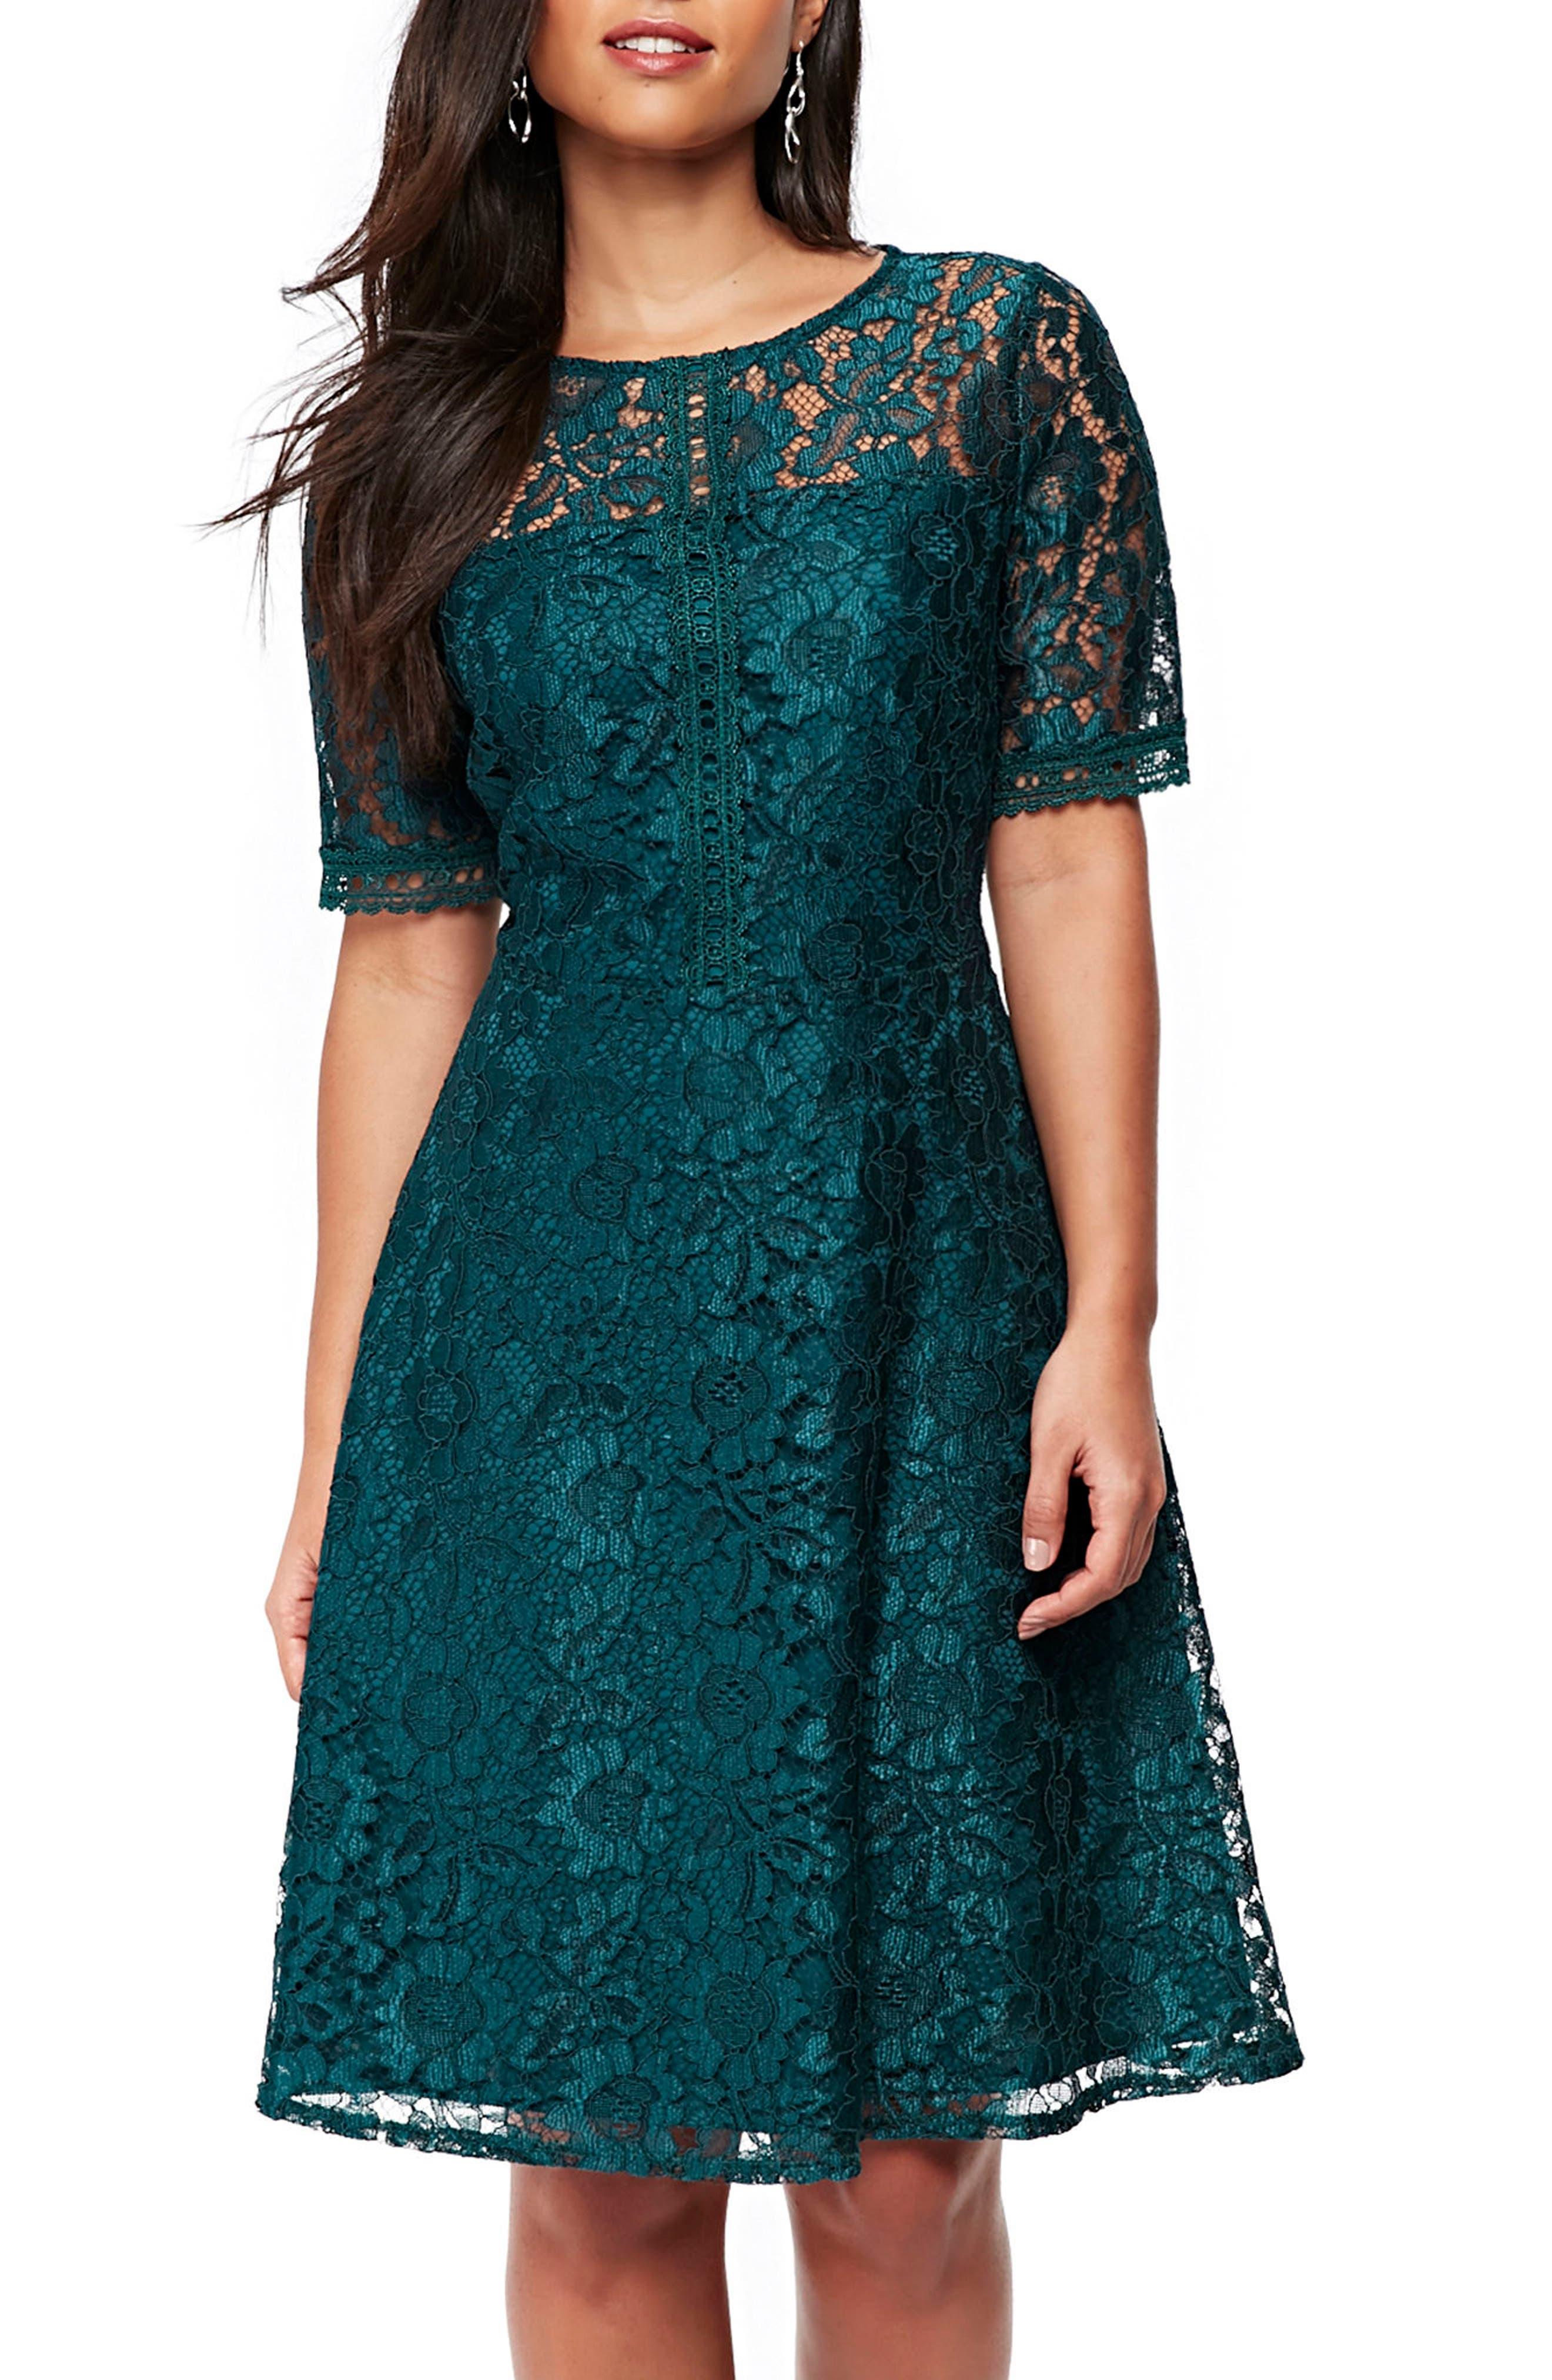 Main Image - Wallis Lace & Lattice Fit & Flare Dress